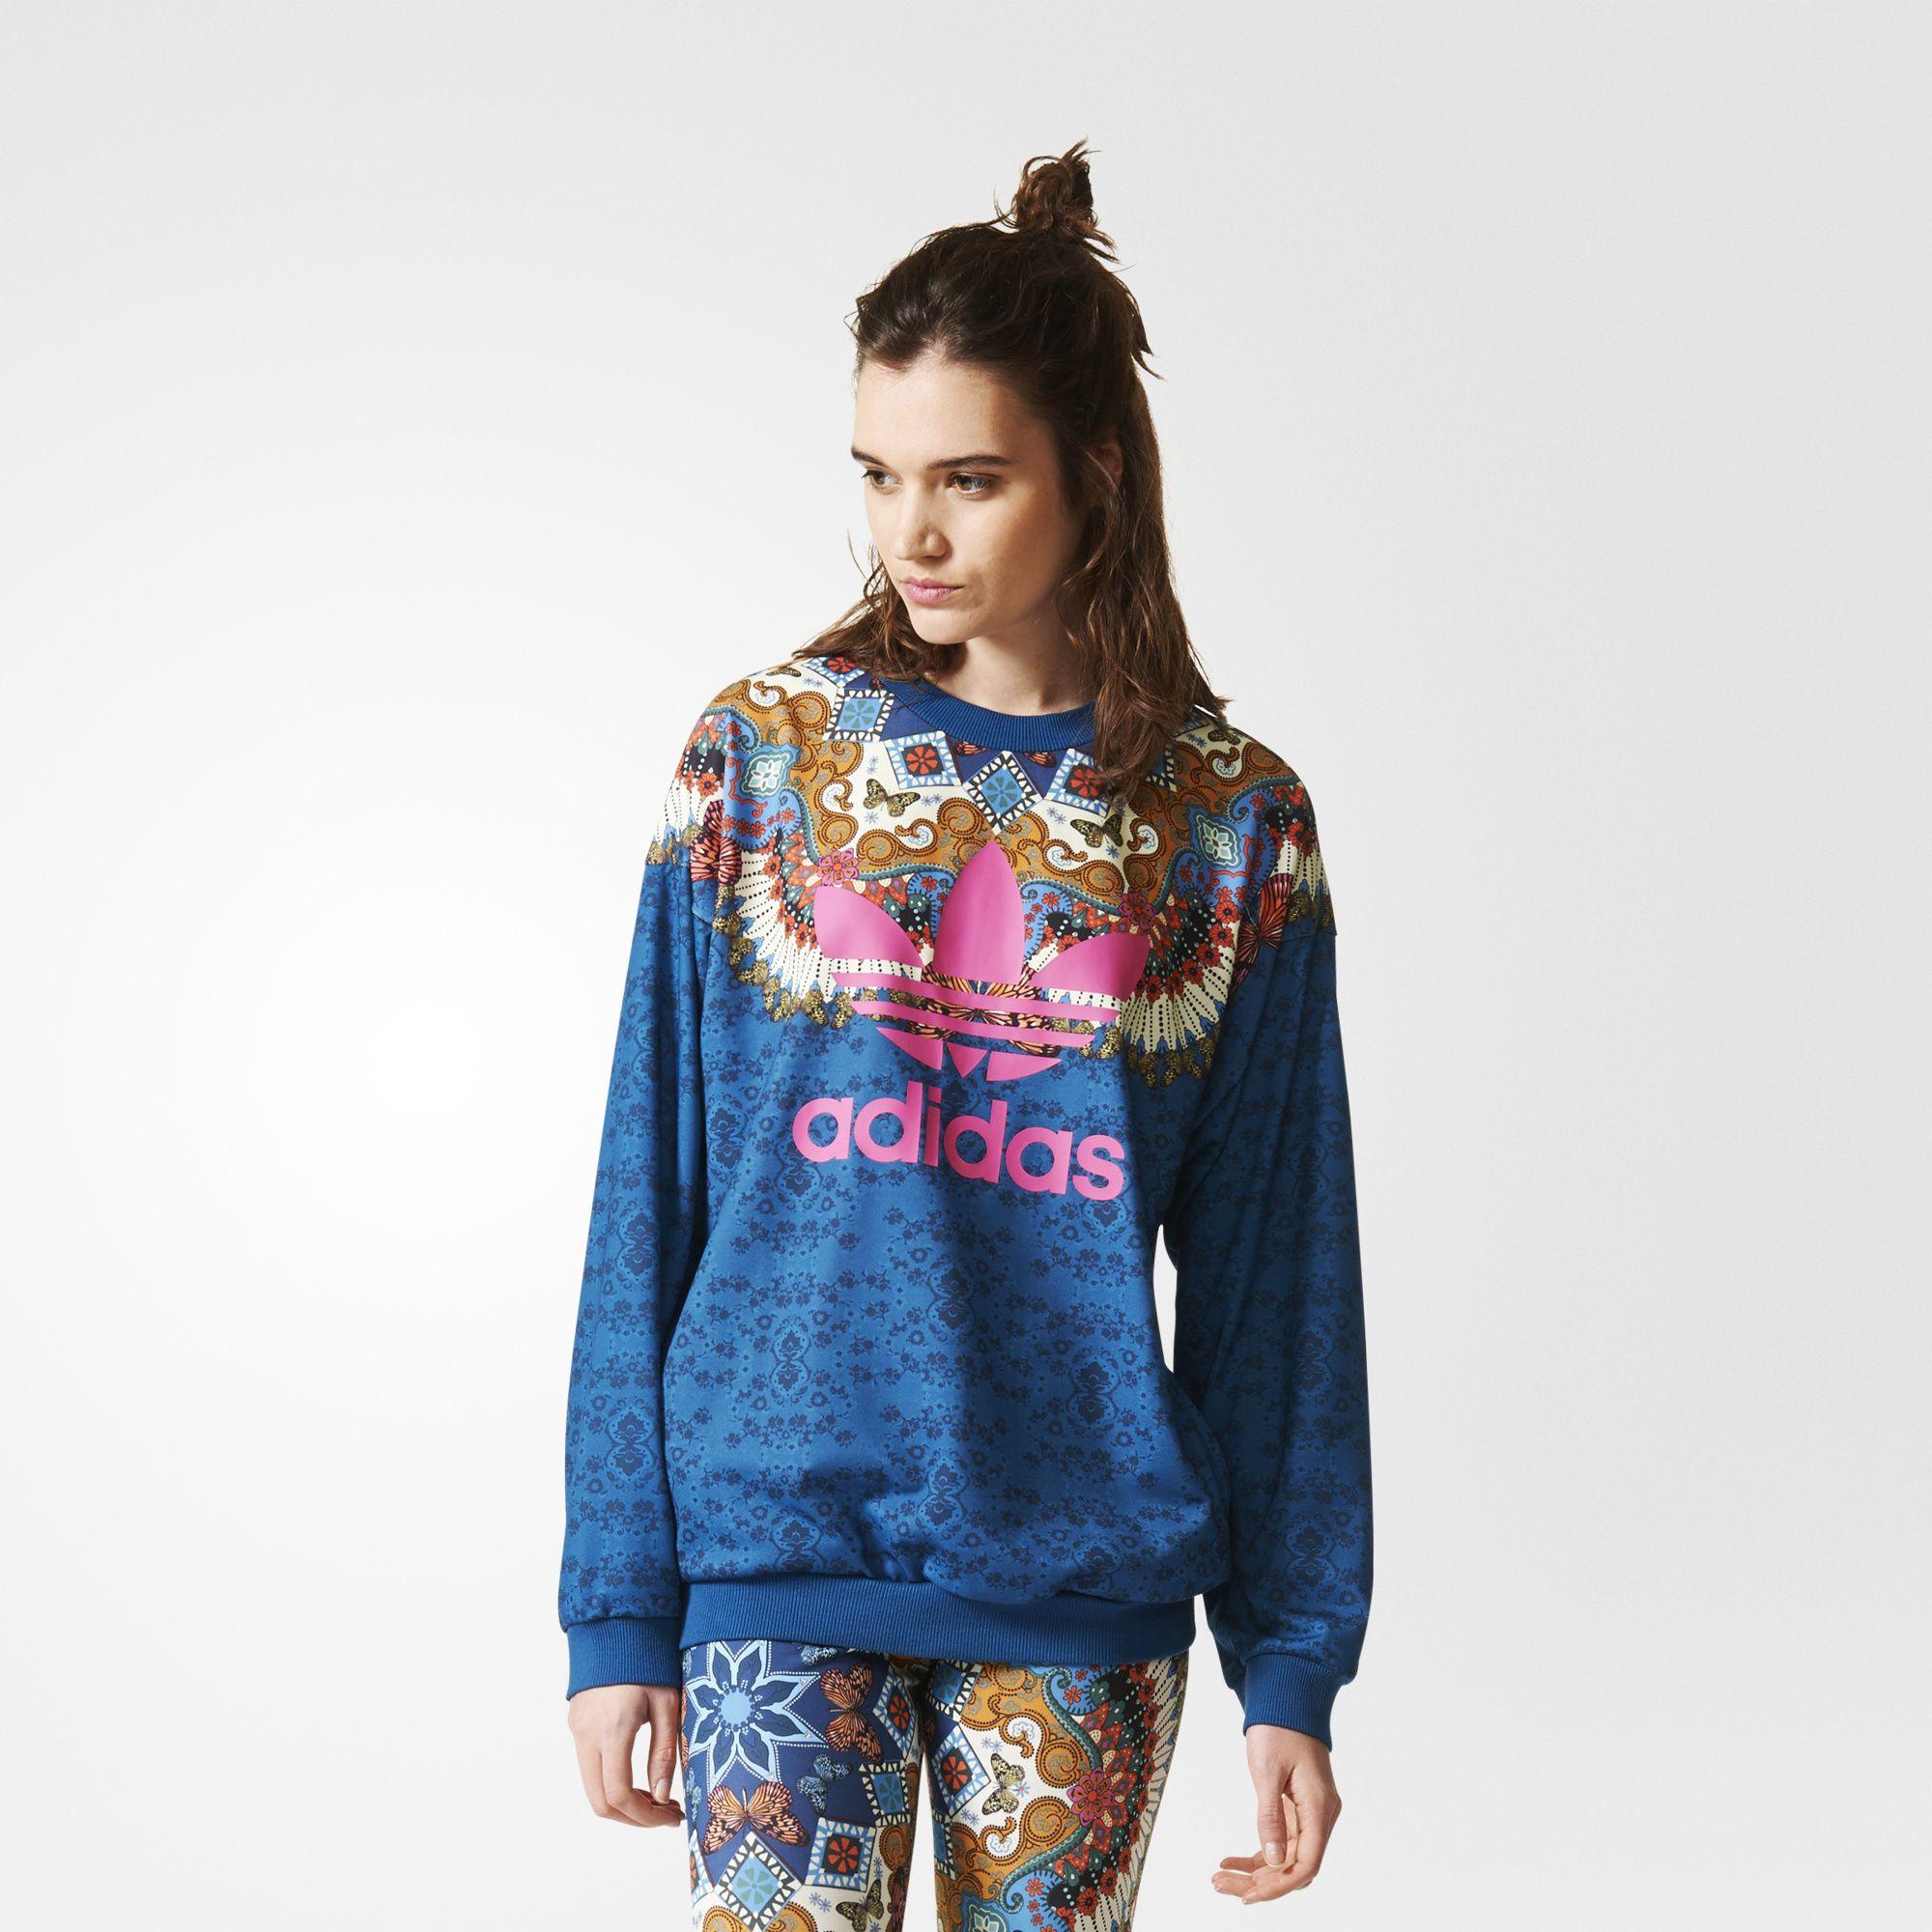 f0a9038362e2 adidas Borbomix Sweatshirt - Womens Hoodies   Sweatshirts ...